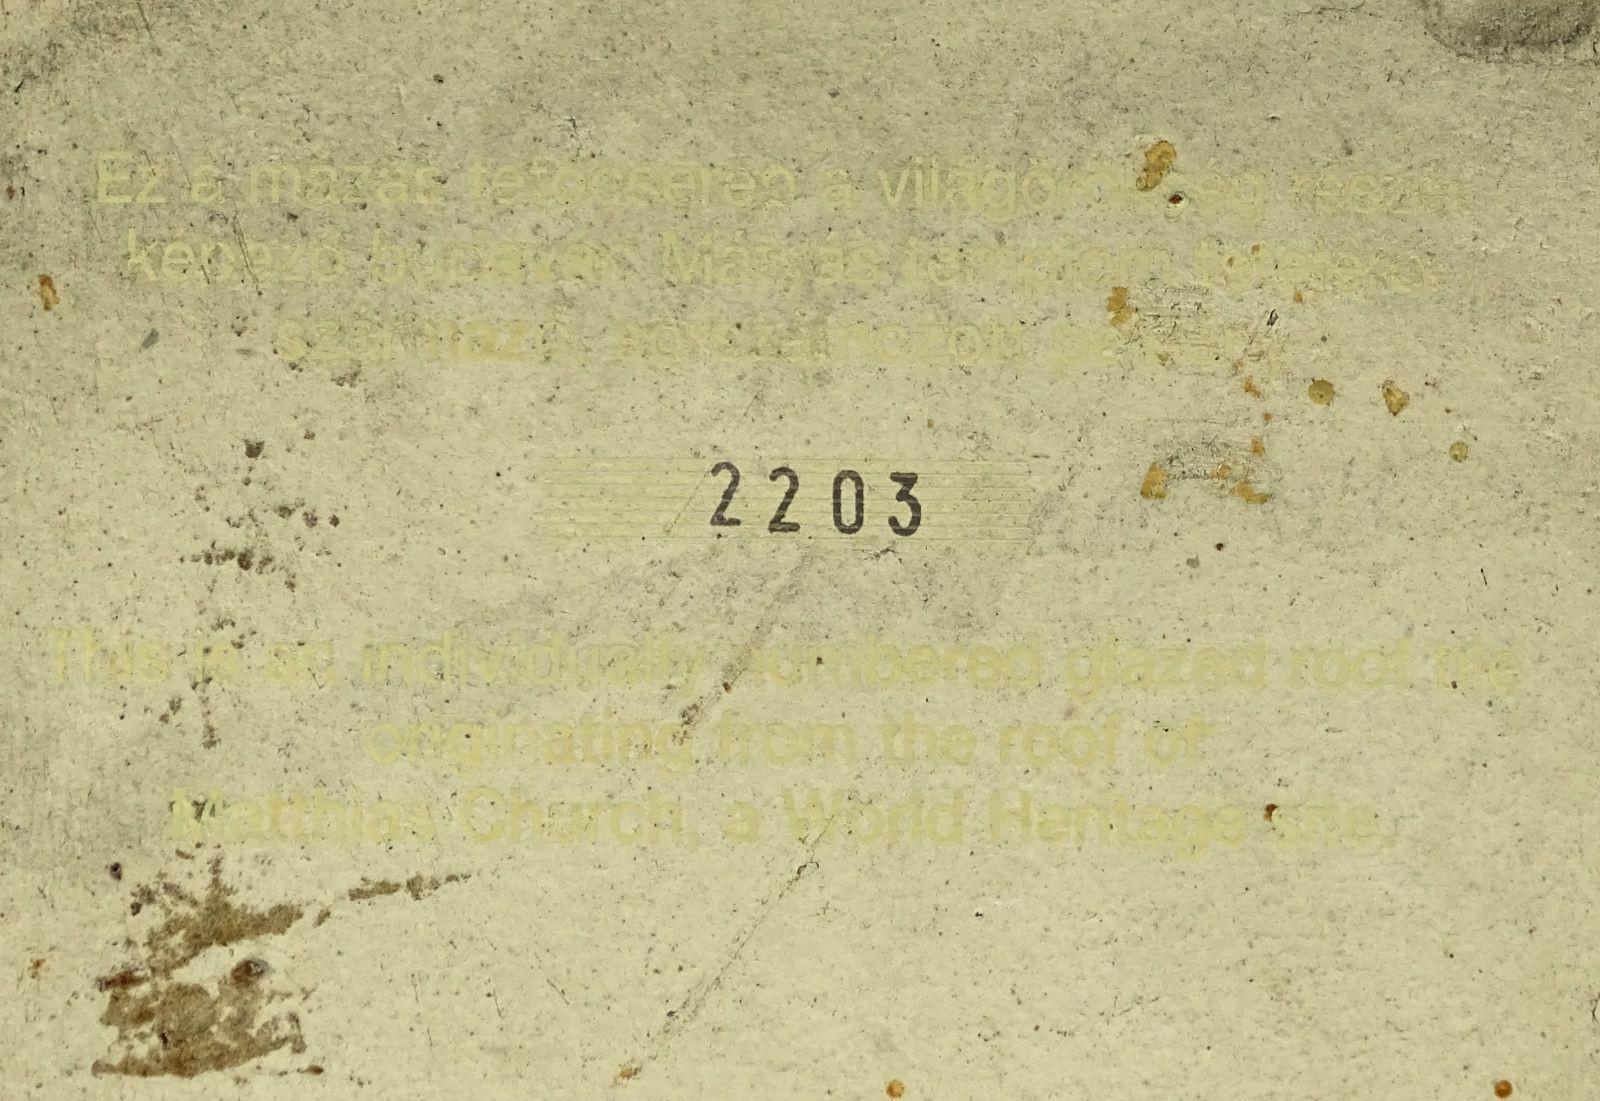 DSC04239.JPG (1600×1101)